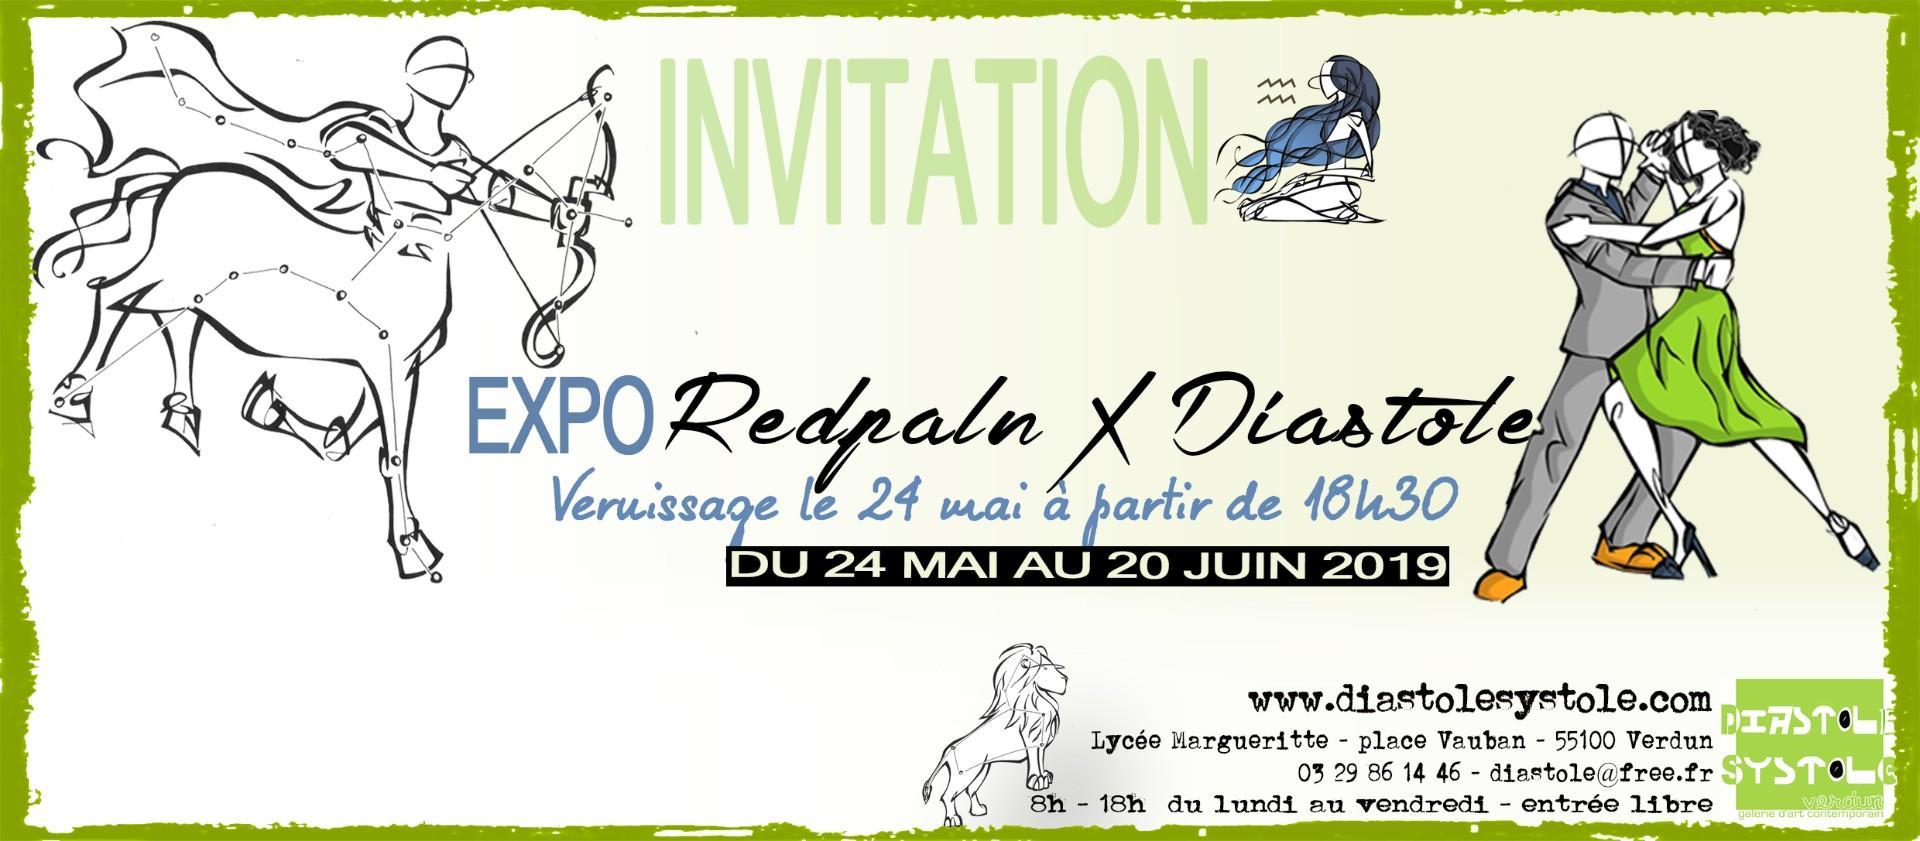 EXPOSITION |REDPALN X DIASTOLE